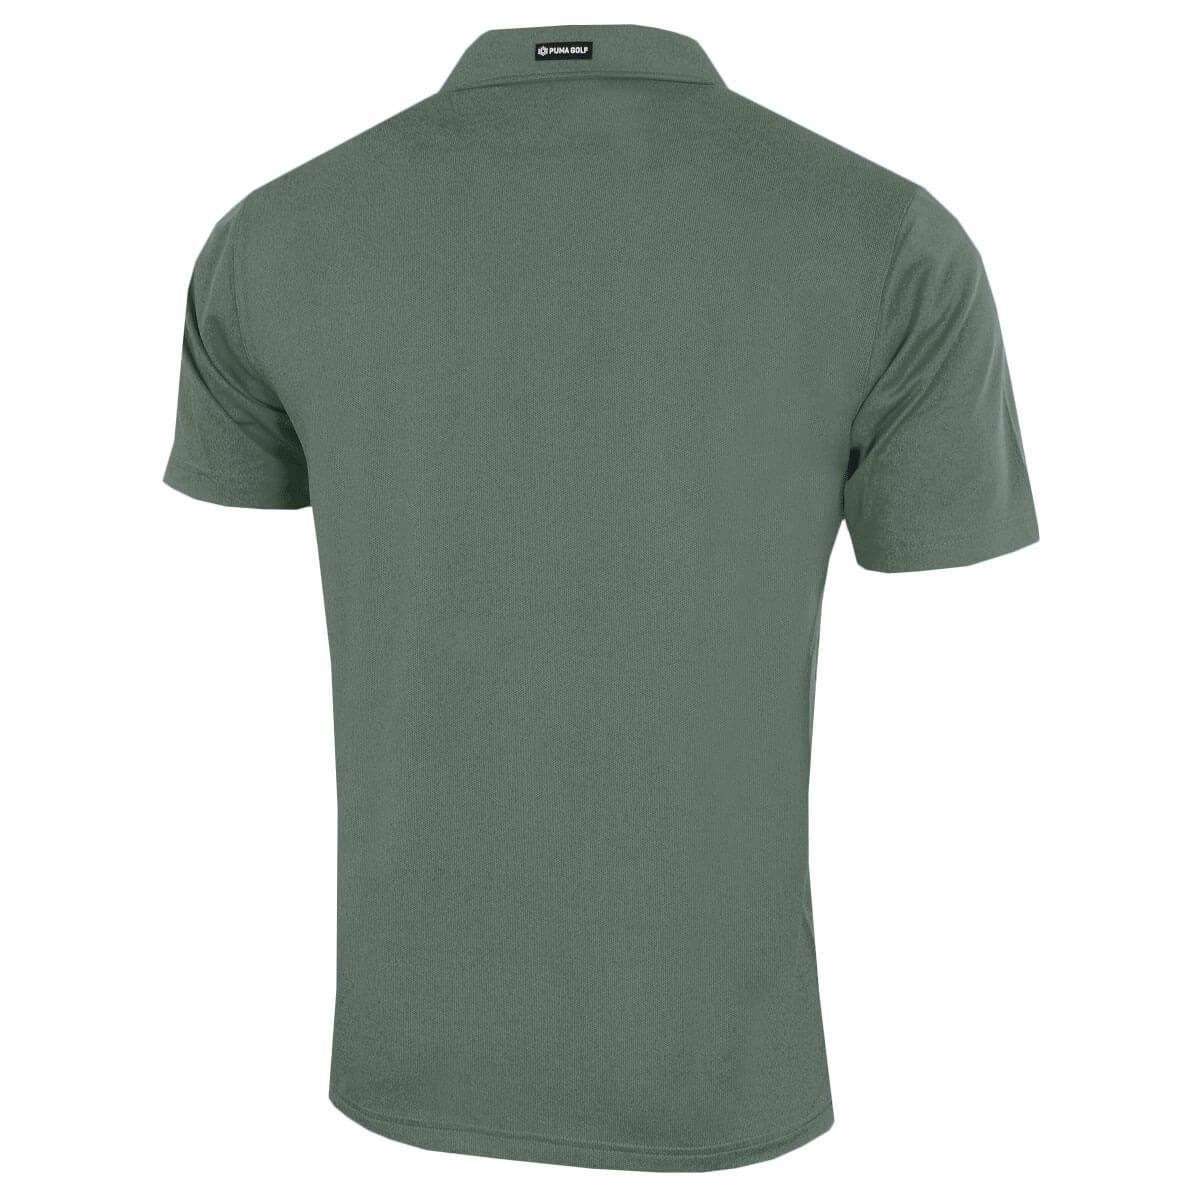 Puma-Golf-Mens-Essential-Pounce-Cresting-DryCell-Tech-Polo-Shirt-46-OFF-RRP thumbnail 20